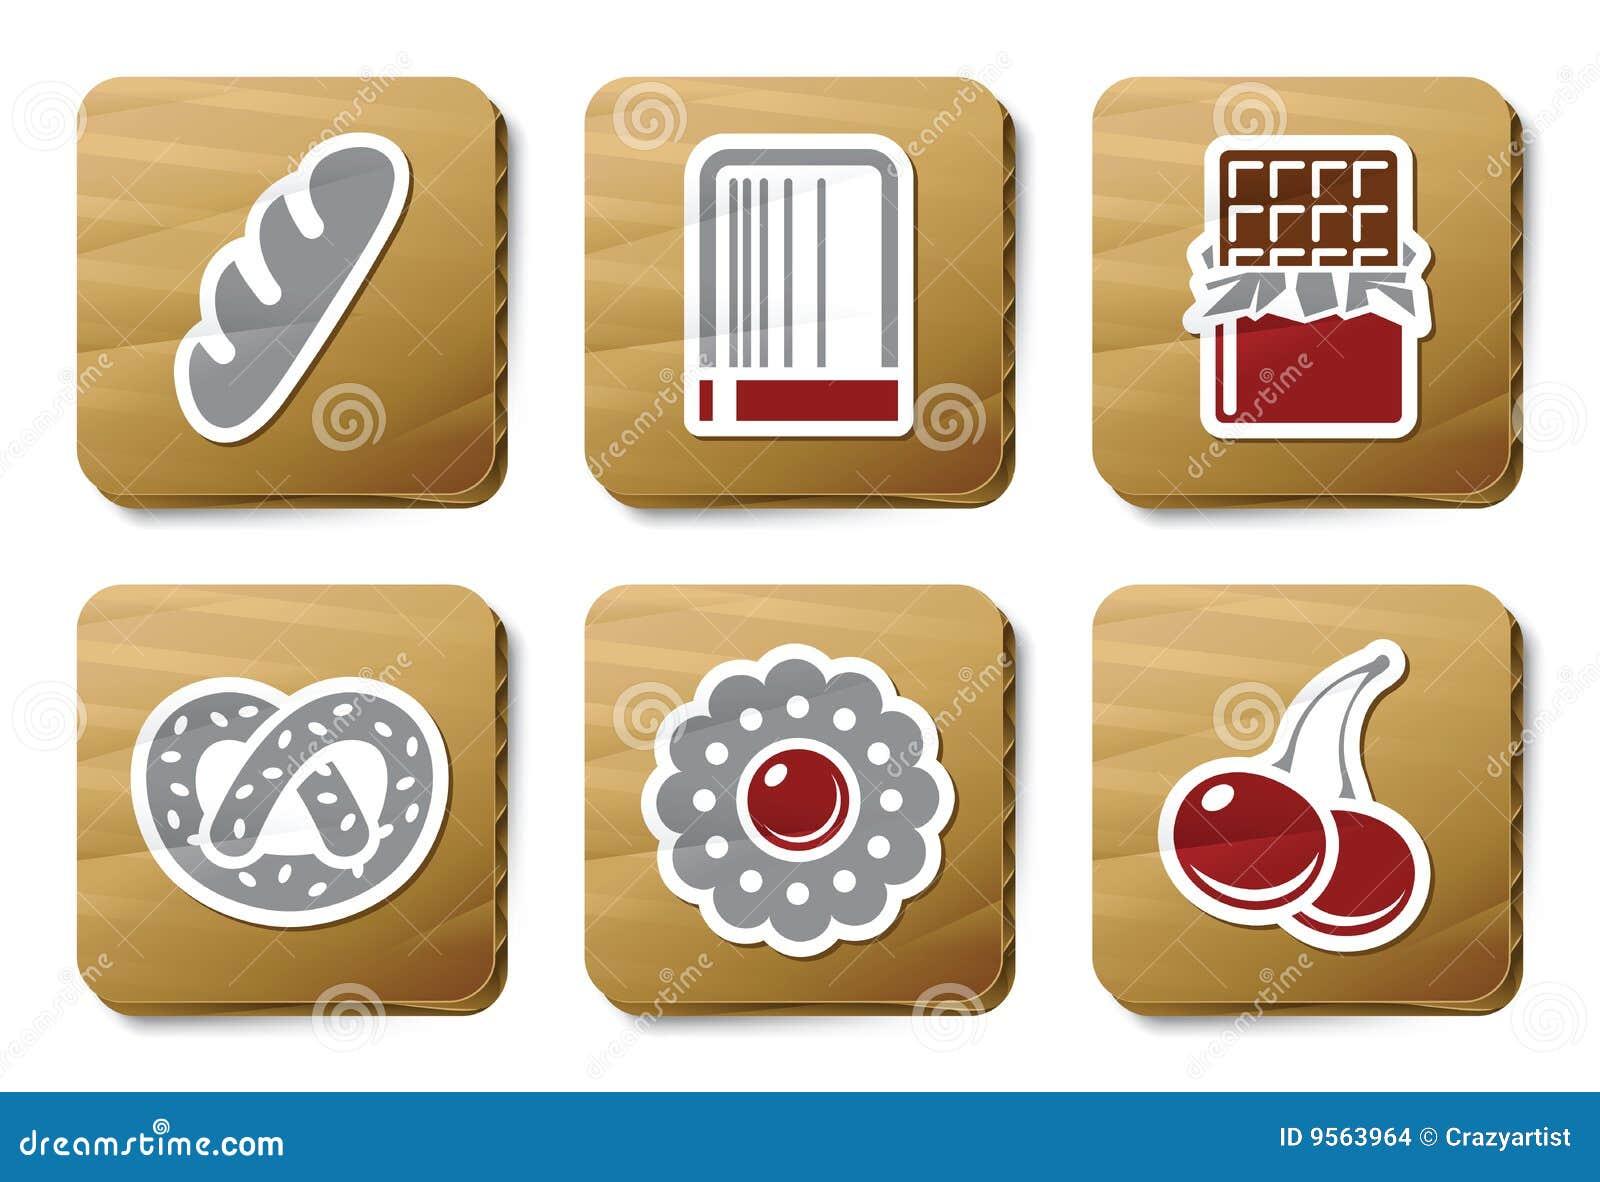 Sweeties and Bakery icons | Cardboard series